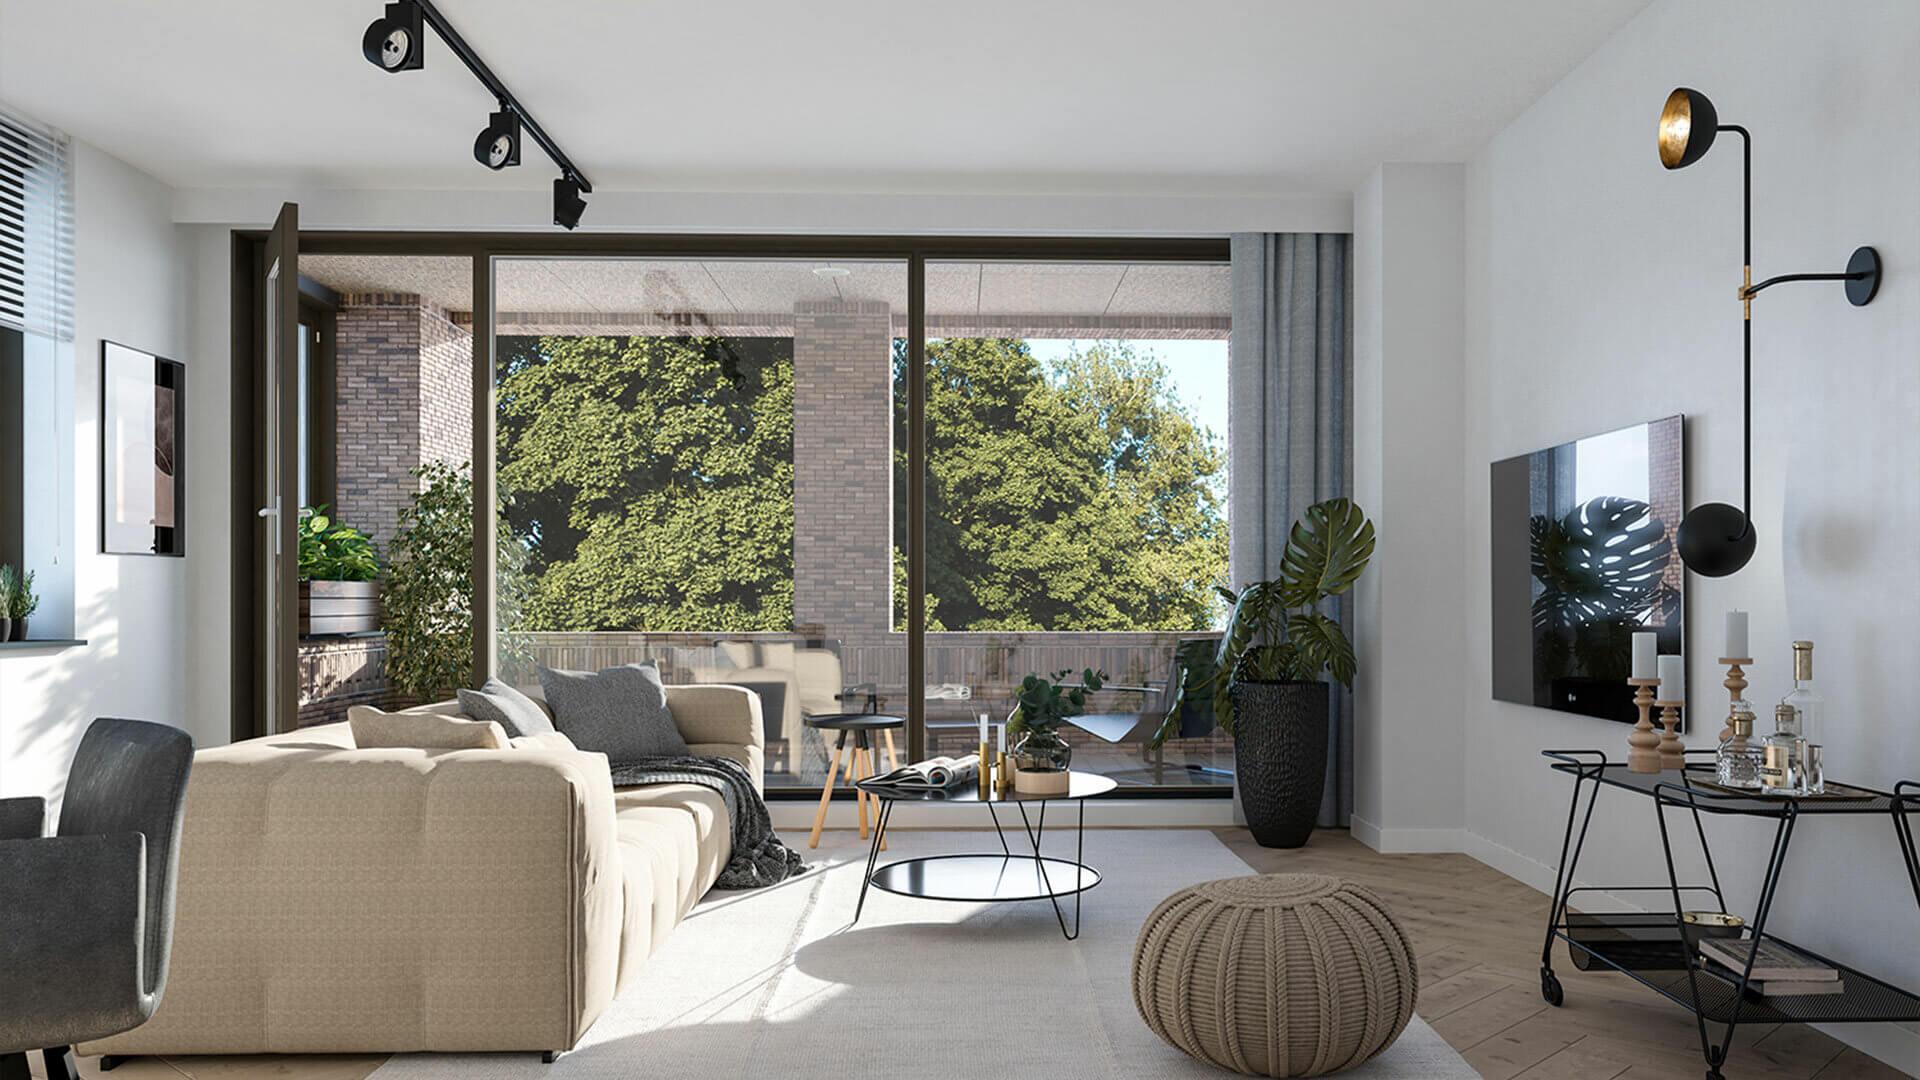 yoreM-WITT-Nieuwbouw-Woerden-appartementen-interieur